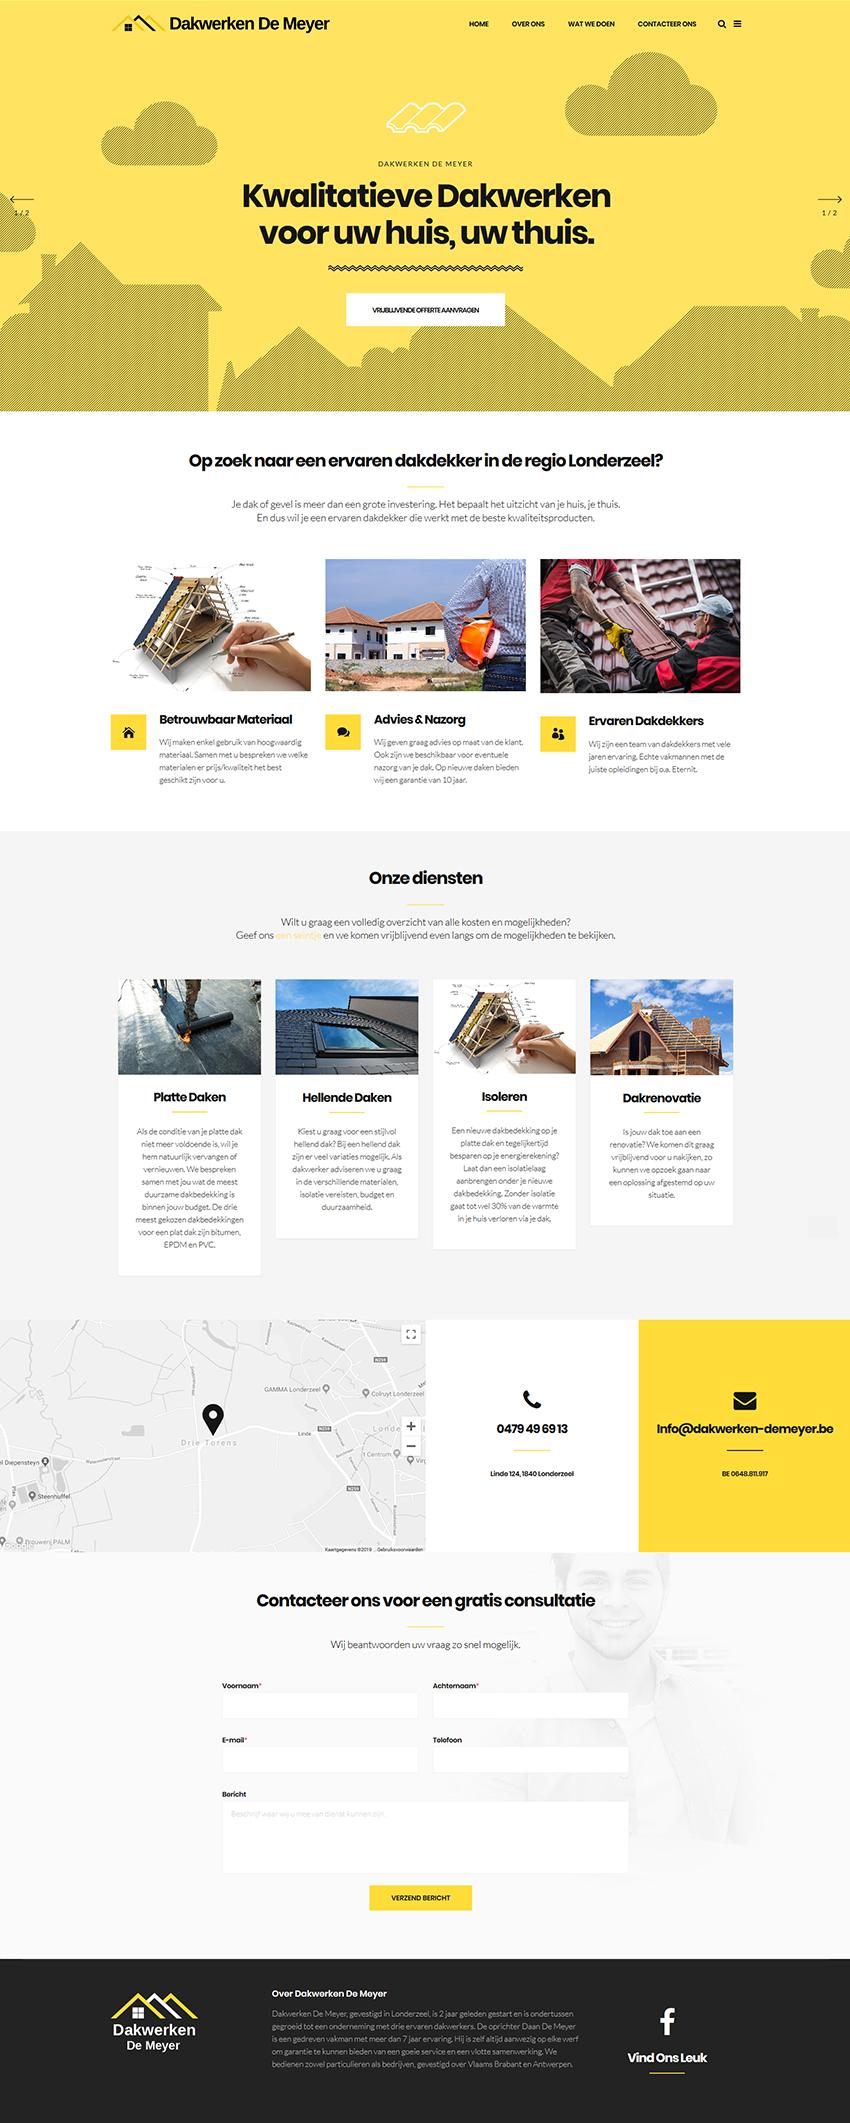 website dakwerken-demeyer.be volledige home-pagina